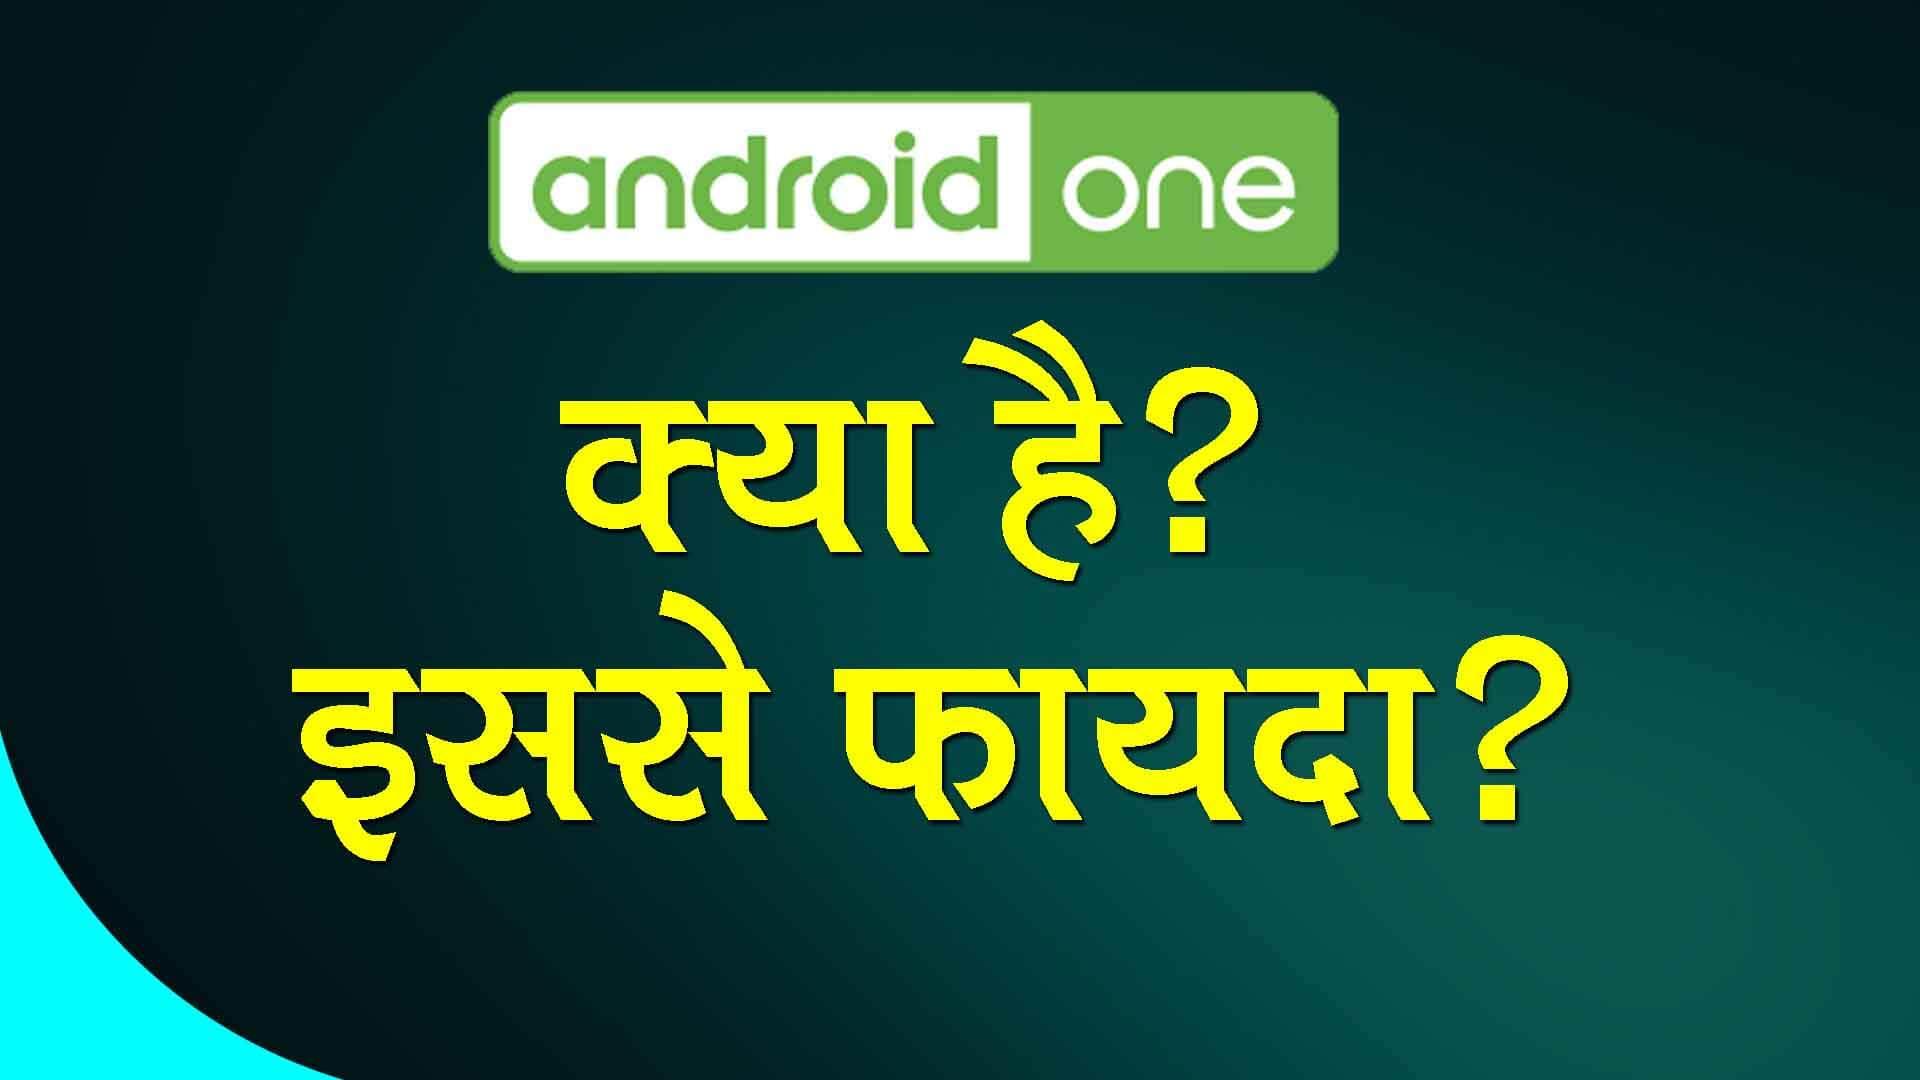 android one kya hai